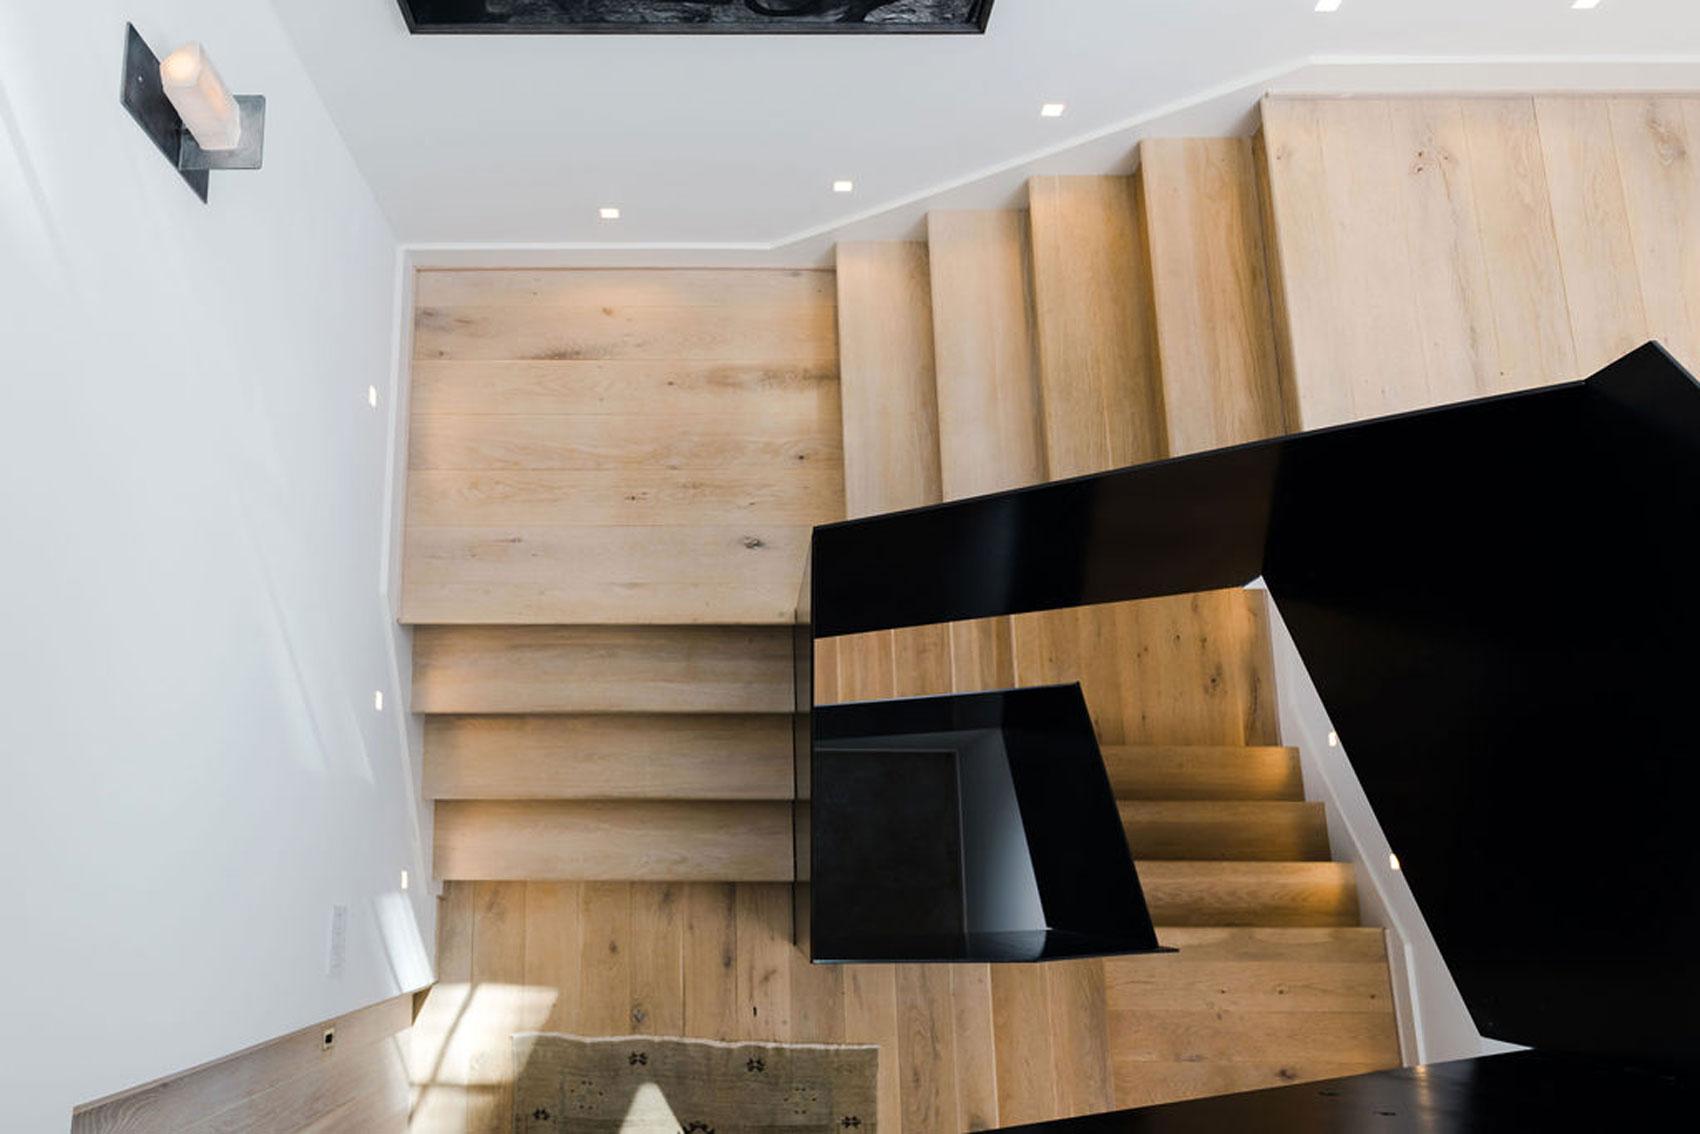 ahp_zarse_staircarse_1